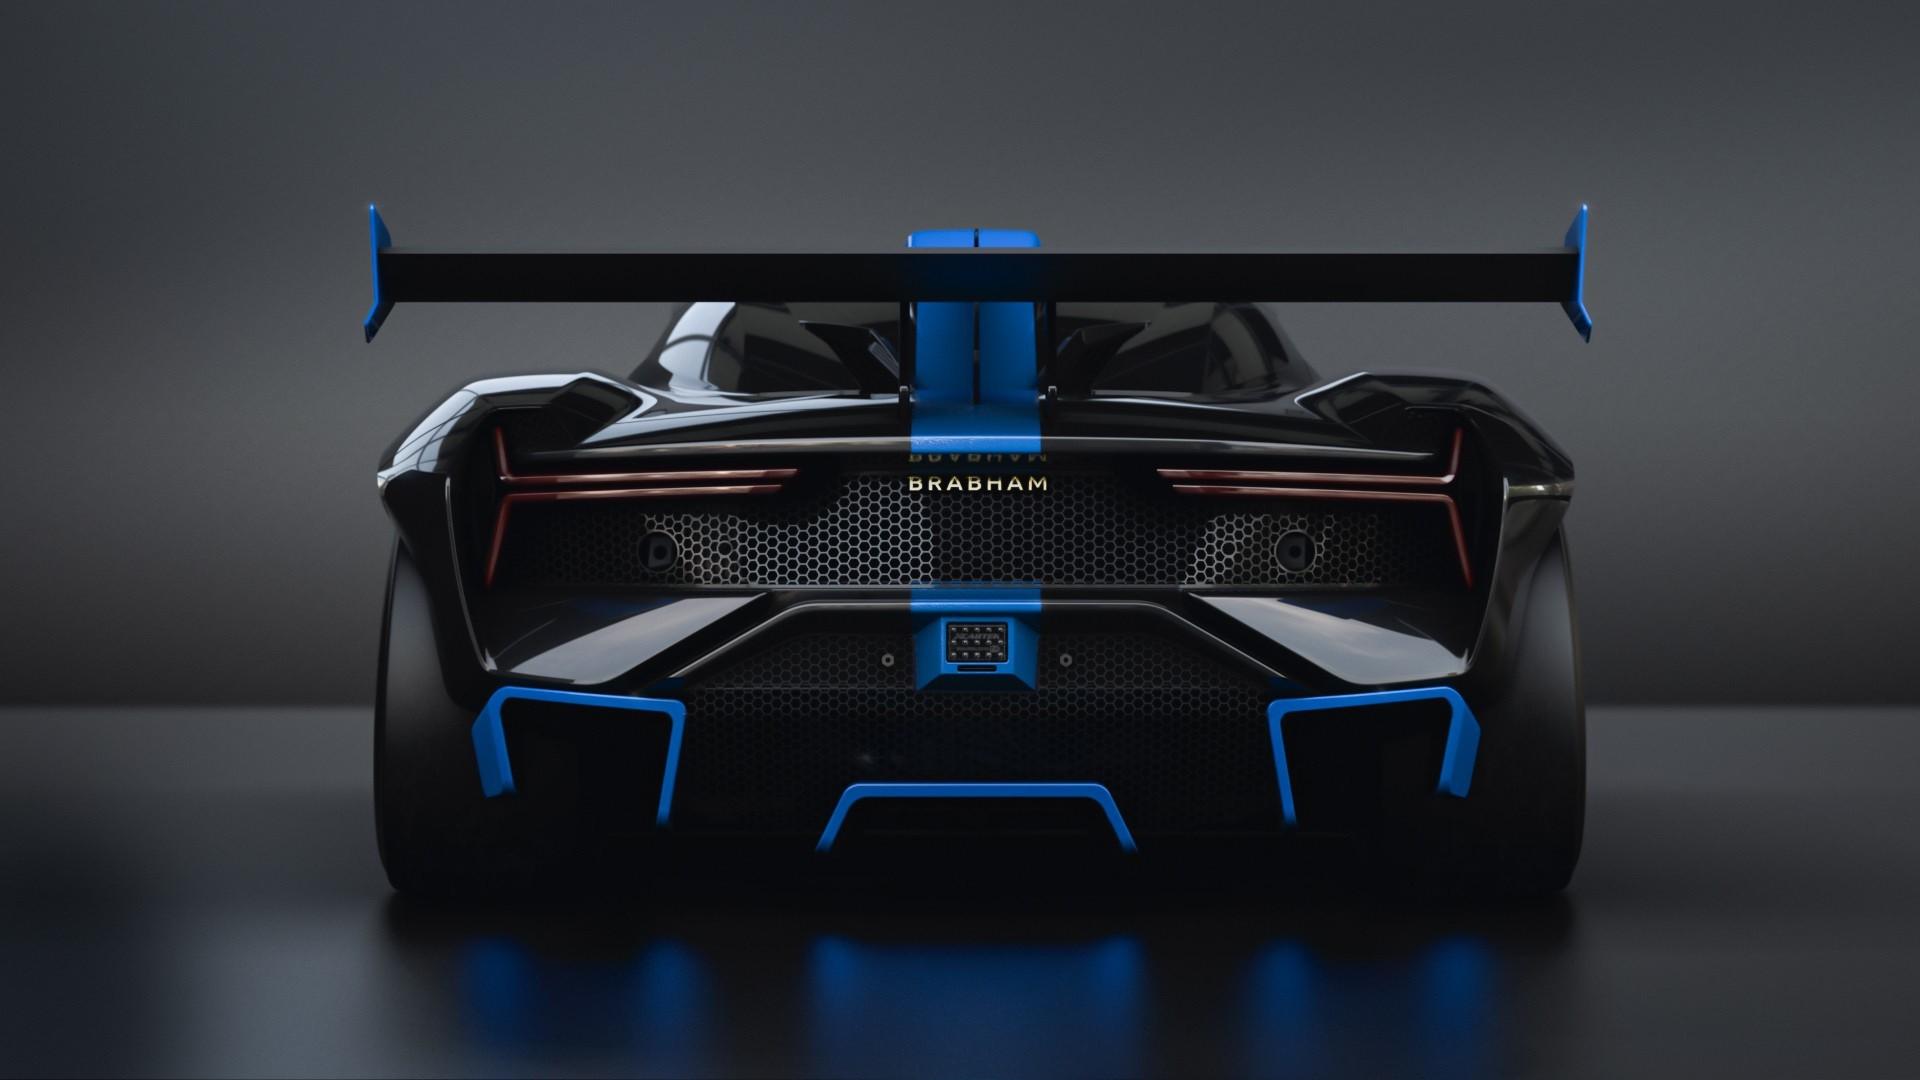 Brabham_BT63_GT2_Concept-0003